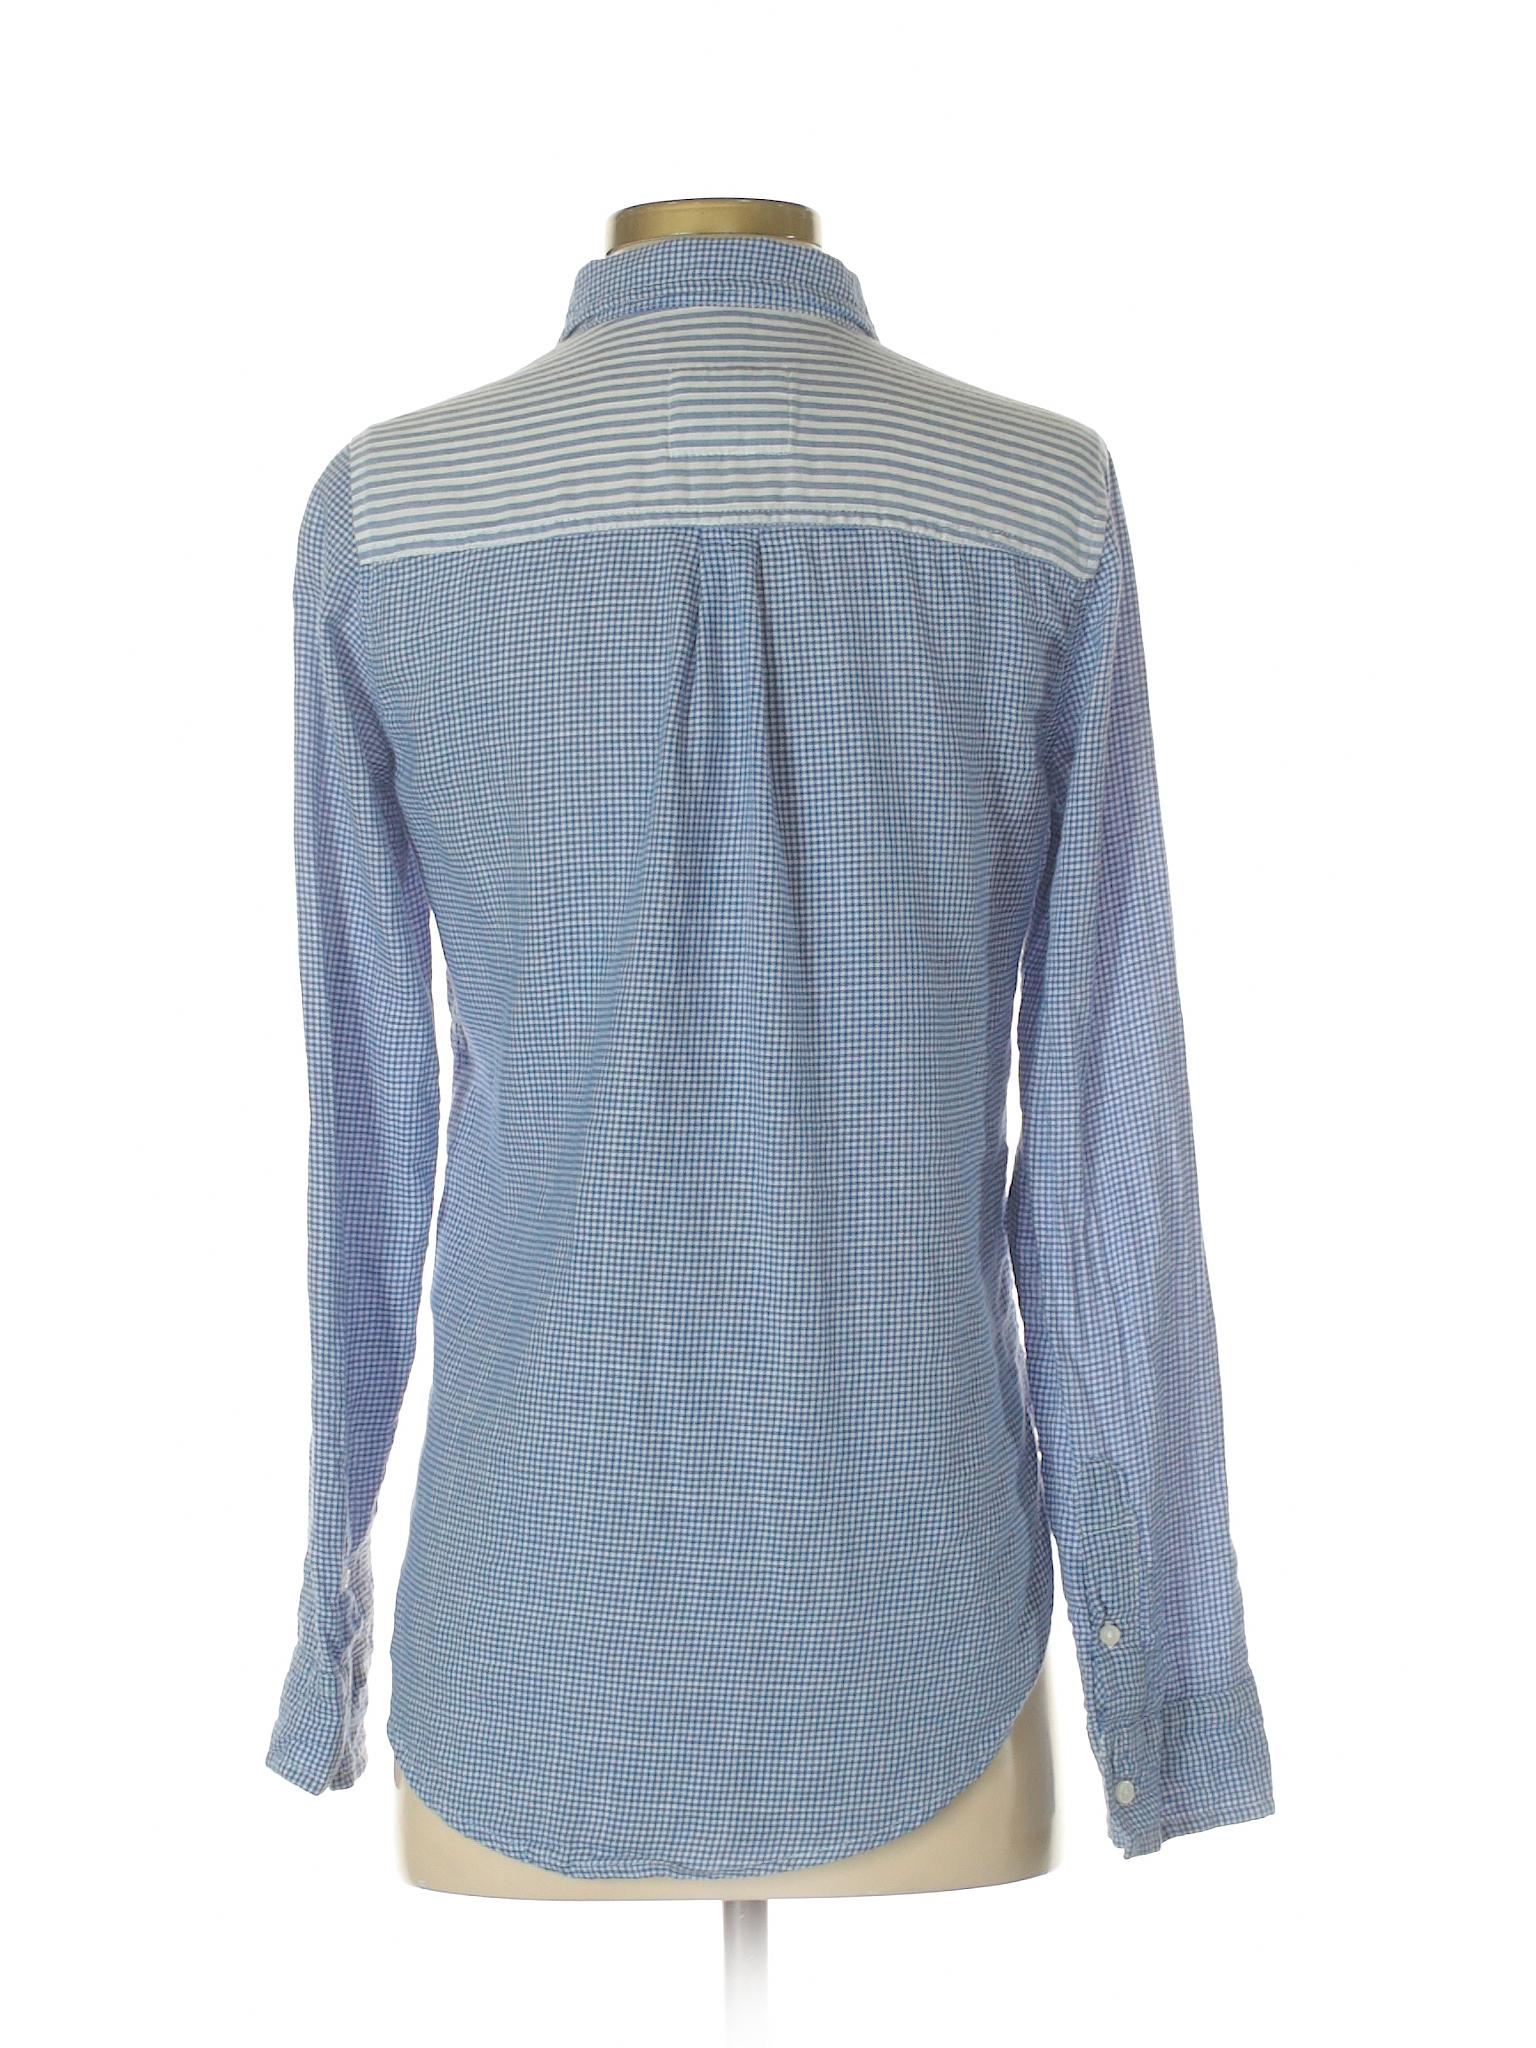 Abercrombie & Fitch Long Sleeve Button Down Shirt Dark Blue Women s